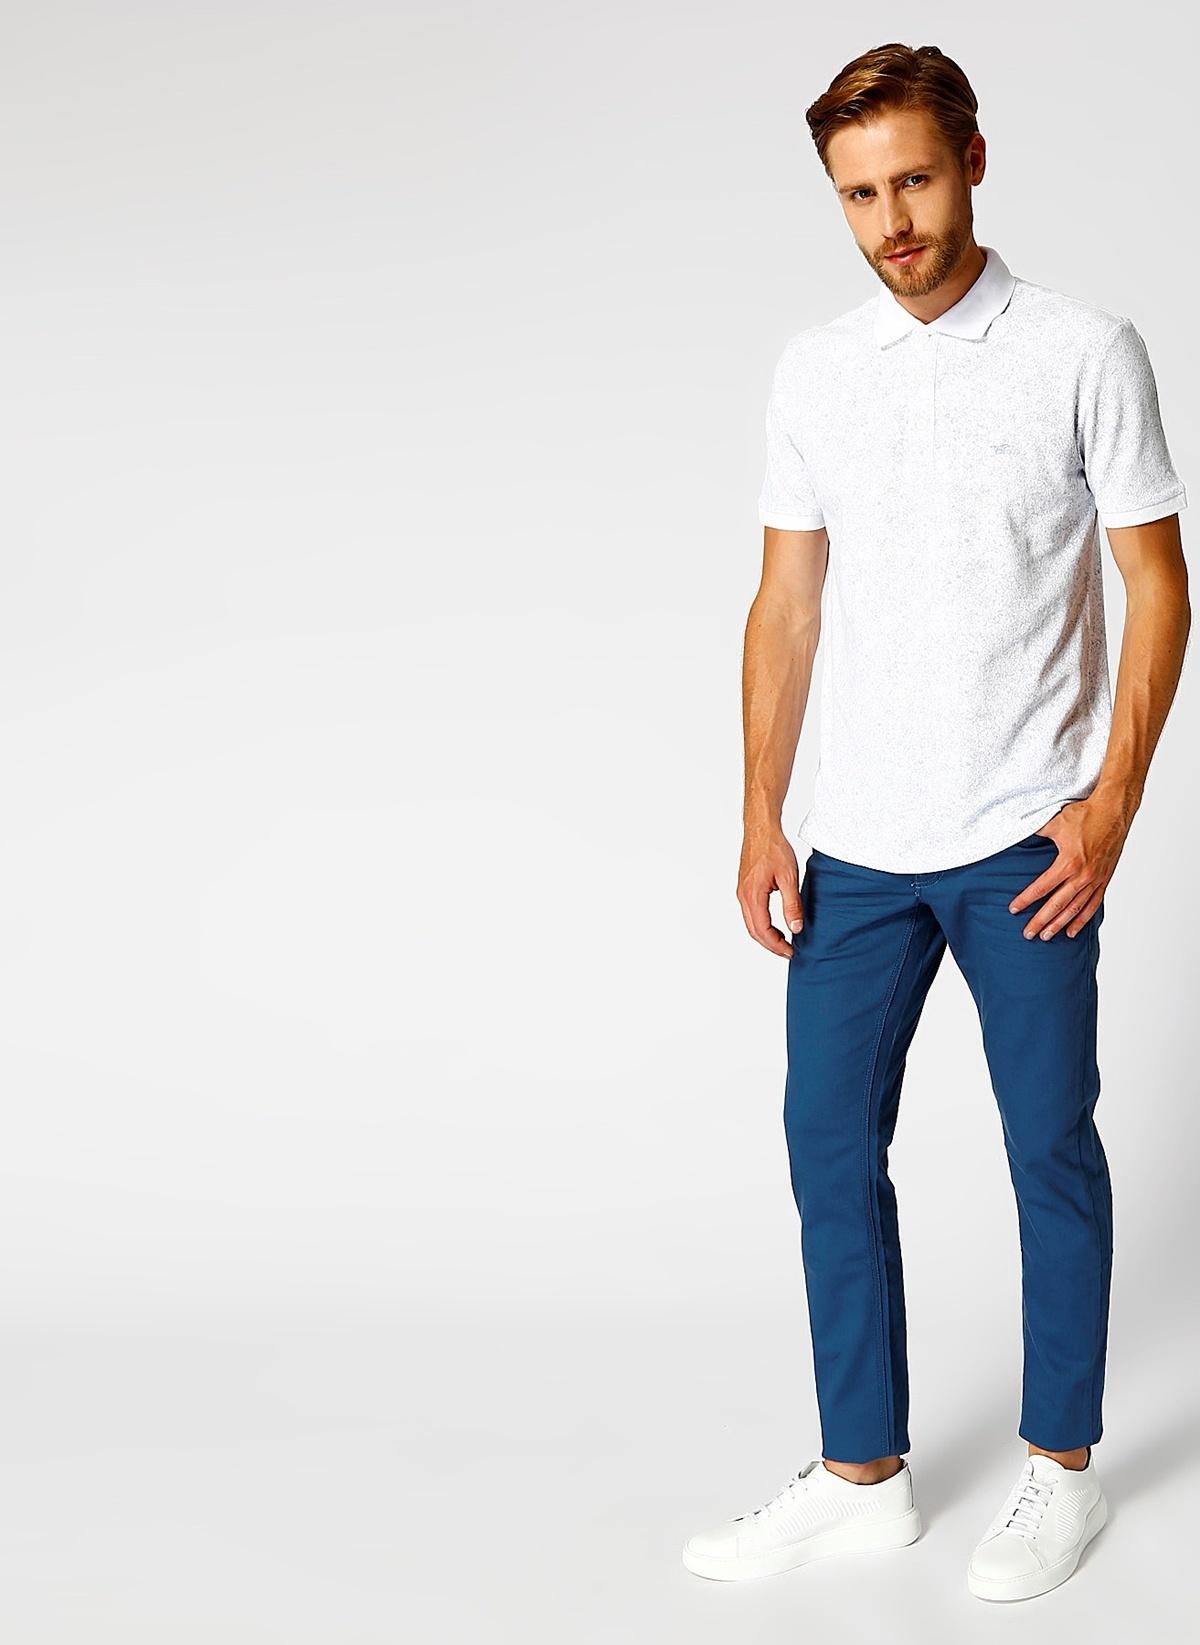 597f6b048d0af Mustang Erkek Klasik Pantolon Mavi İndirimli Fiyat | Morhipo | 23137957